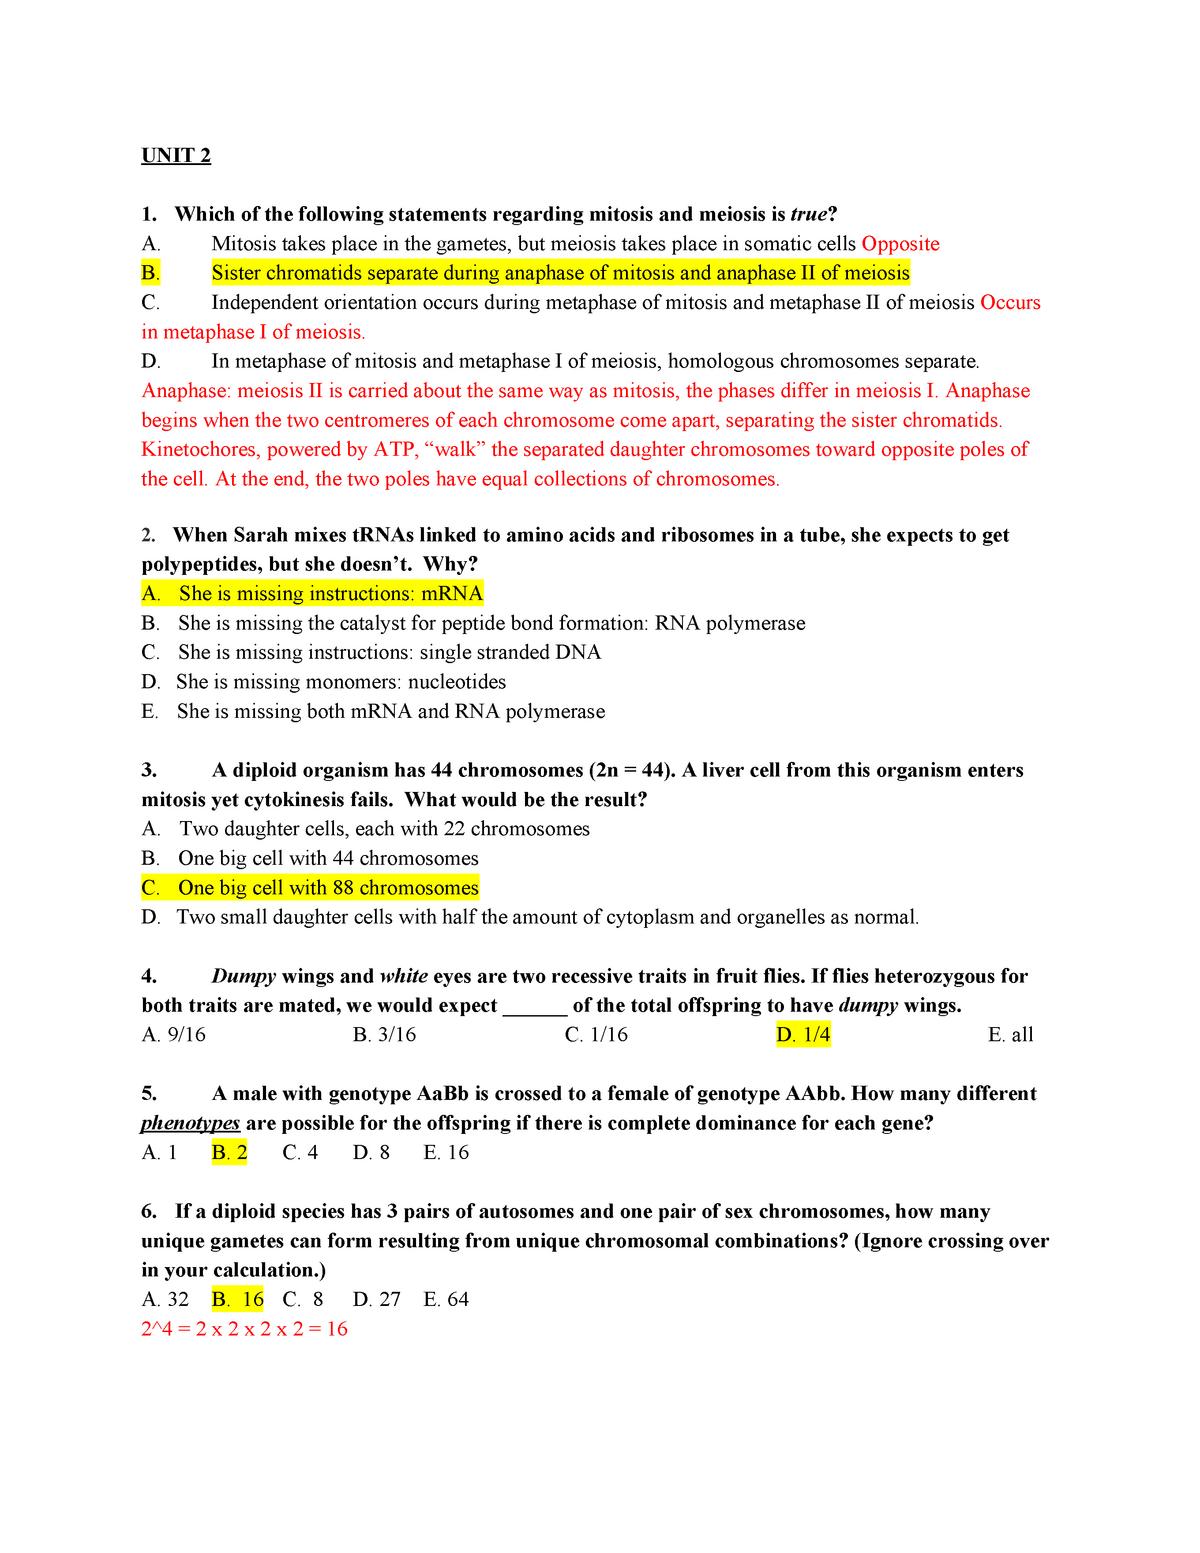 BIO 101 Unit 2 Practice Questions - StuDocu